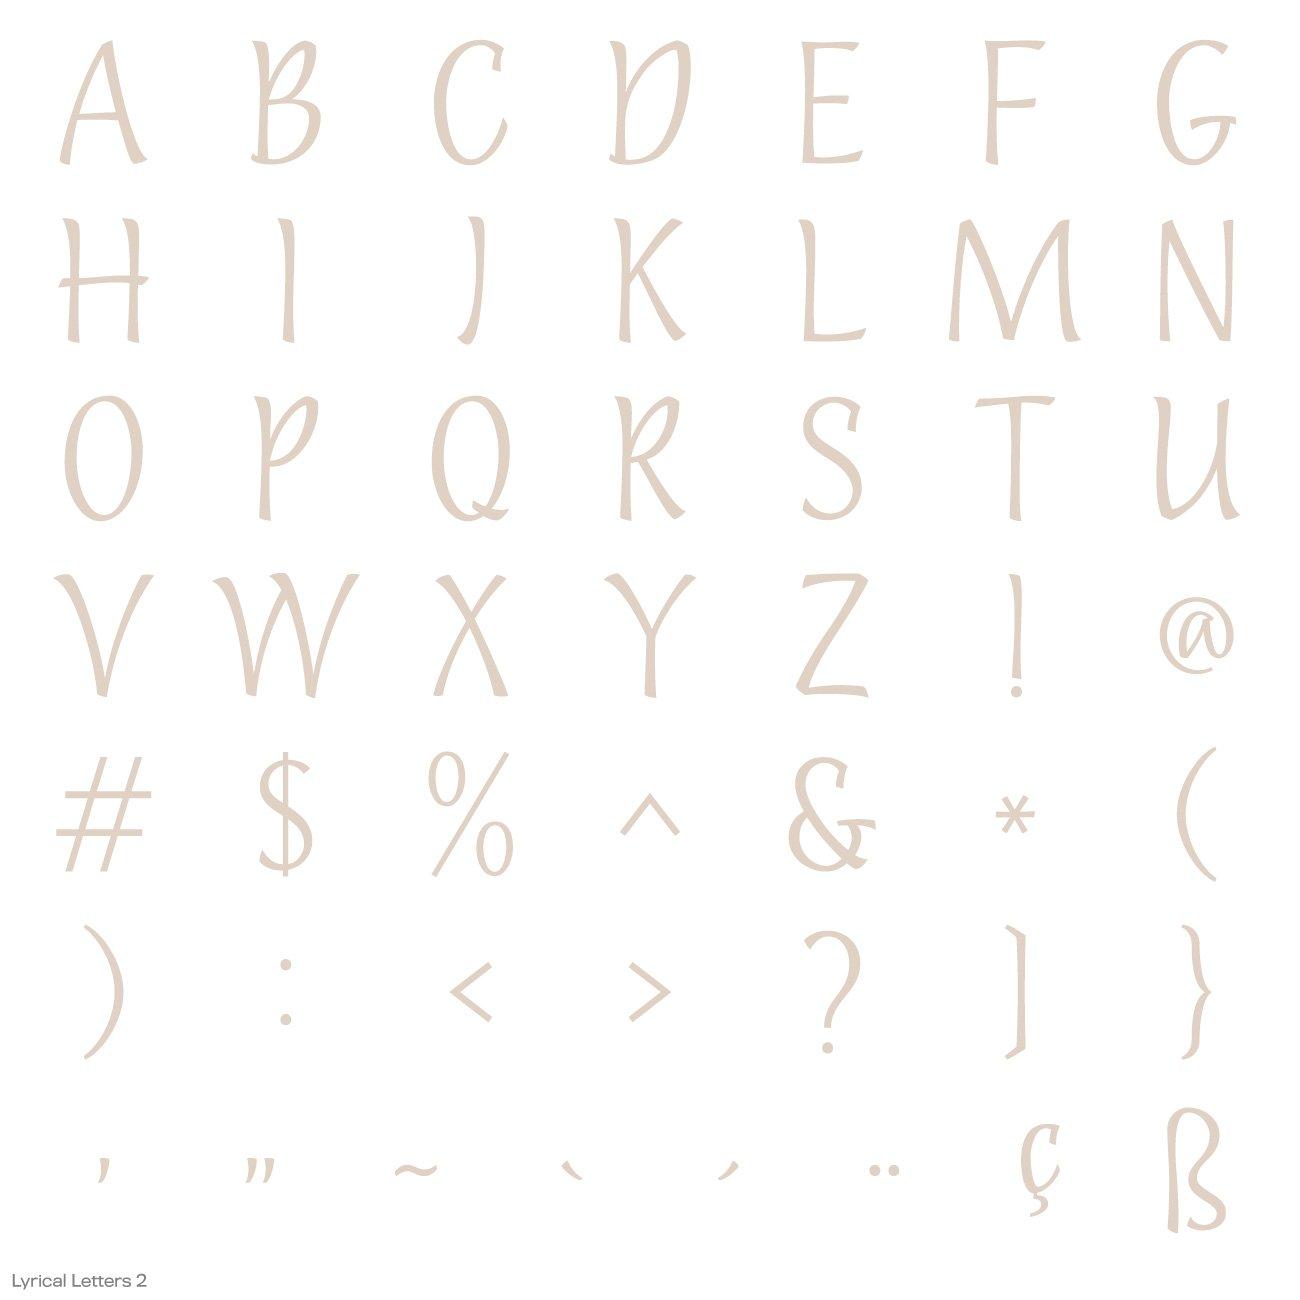 Cricut Lyrical Letters 2 Cartridge by Cricut (Image #17)